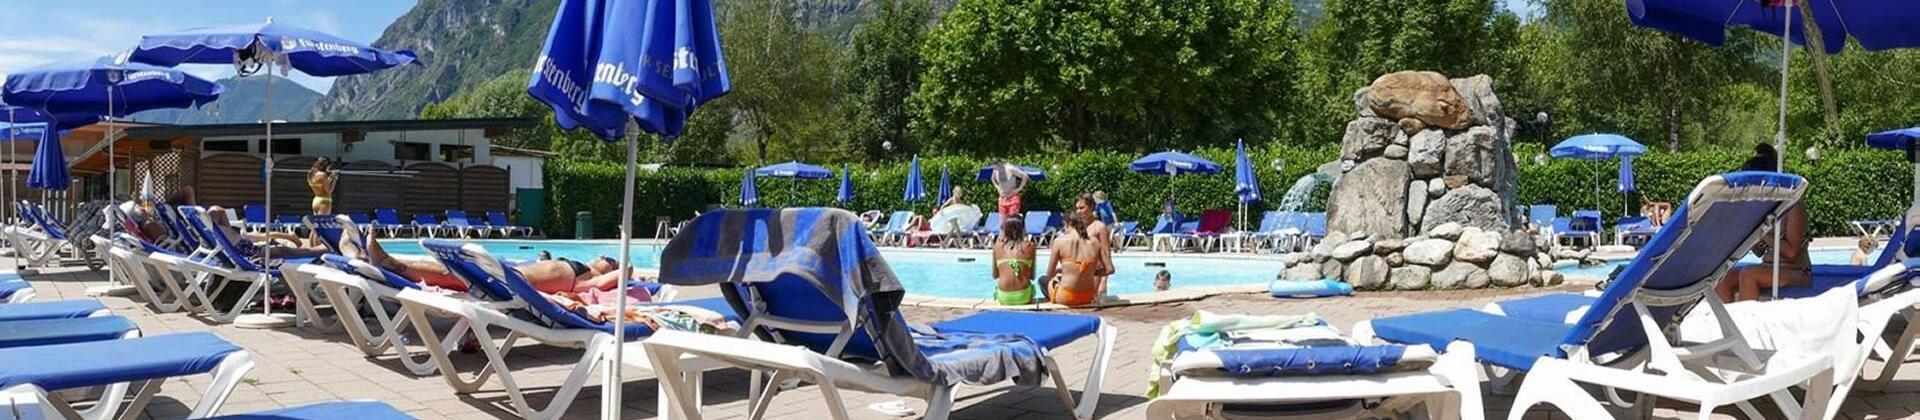 campingdarna it piscina 013